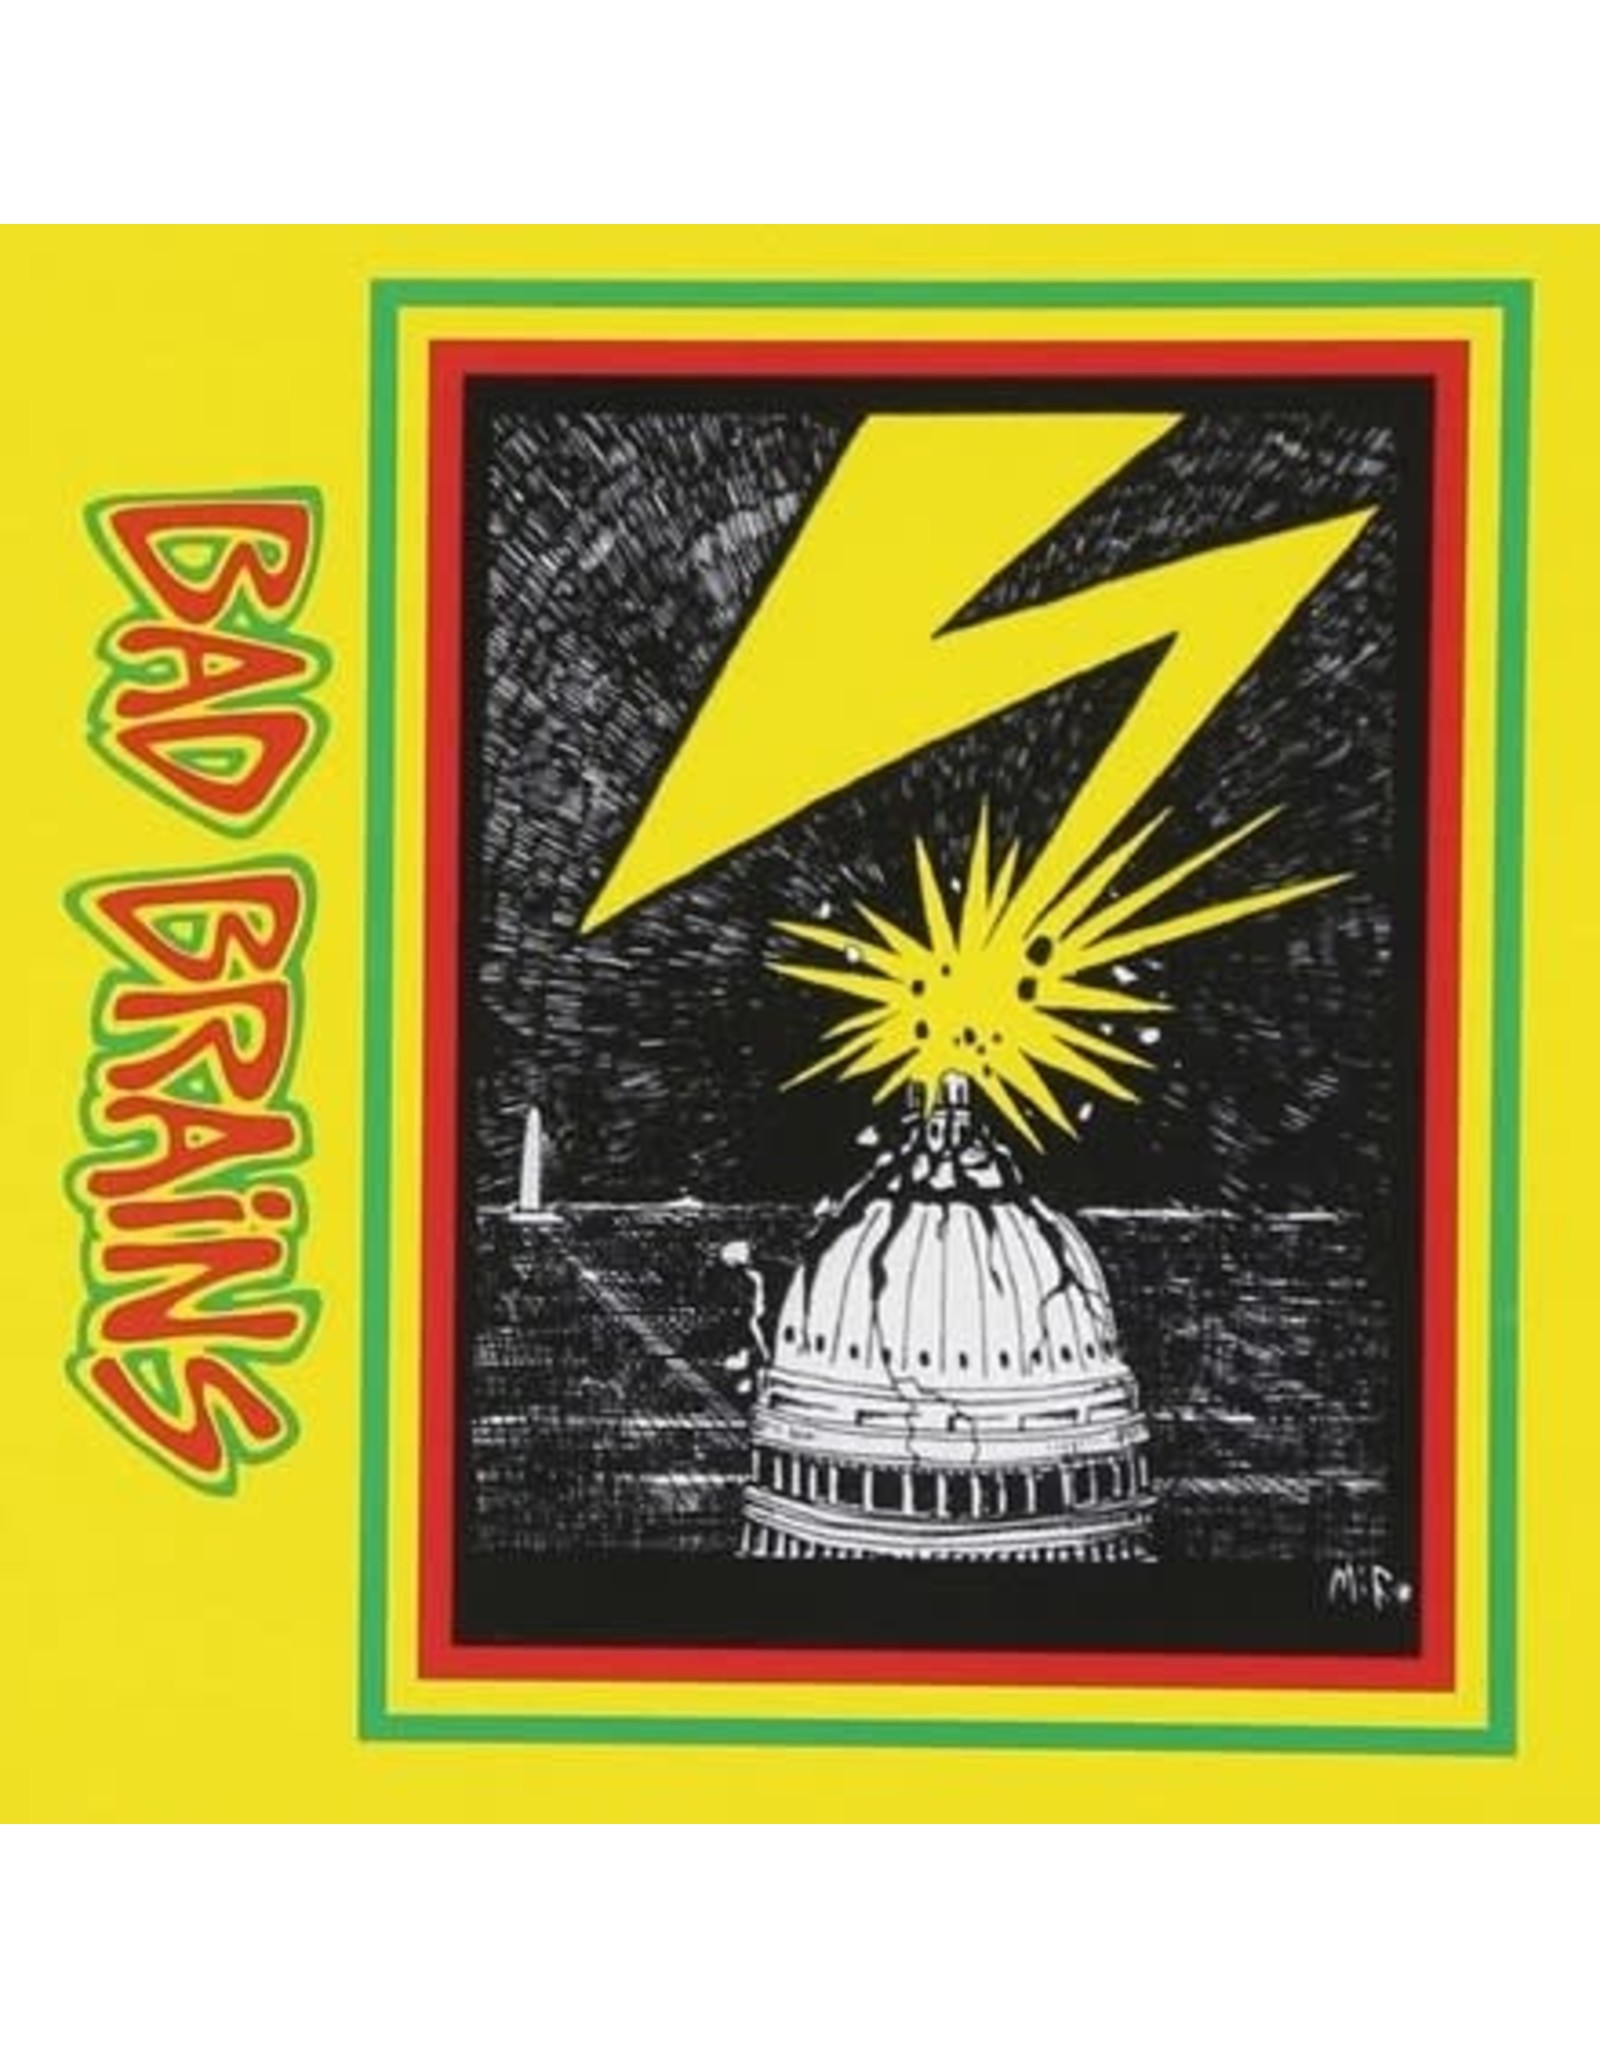 ORG Bad Brains: Bad Brains (Red & White splatter) LP